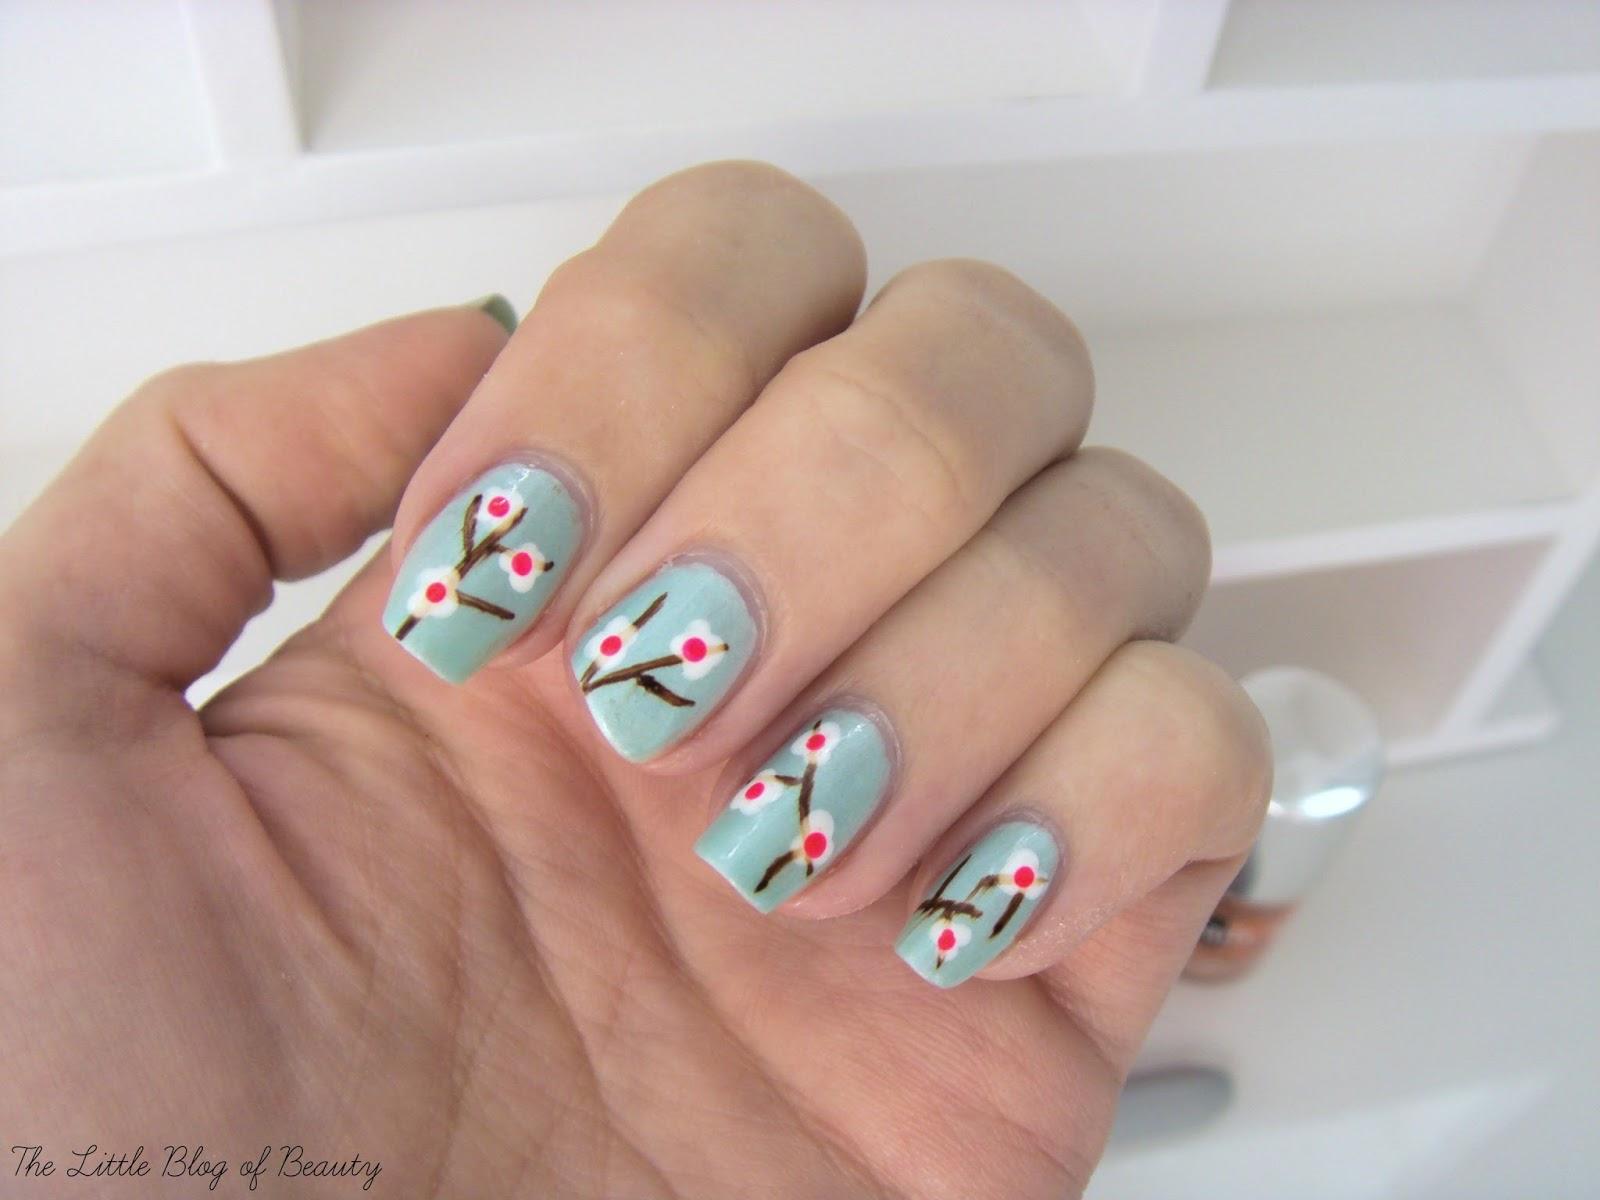 Nail art - Japanese cherry blossom | The Little Blog of Beauty